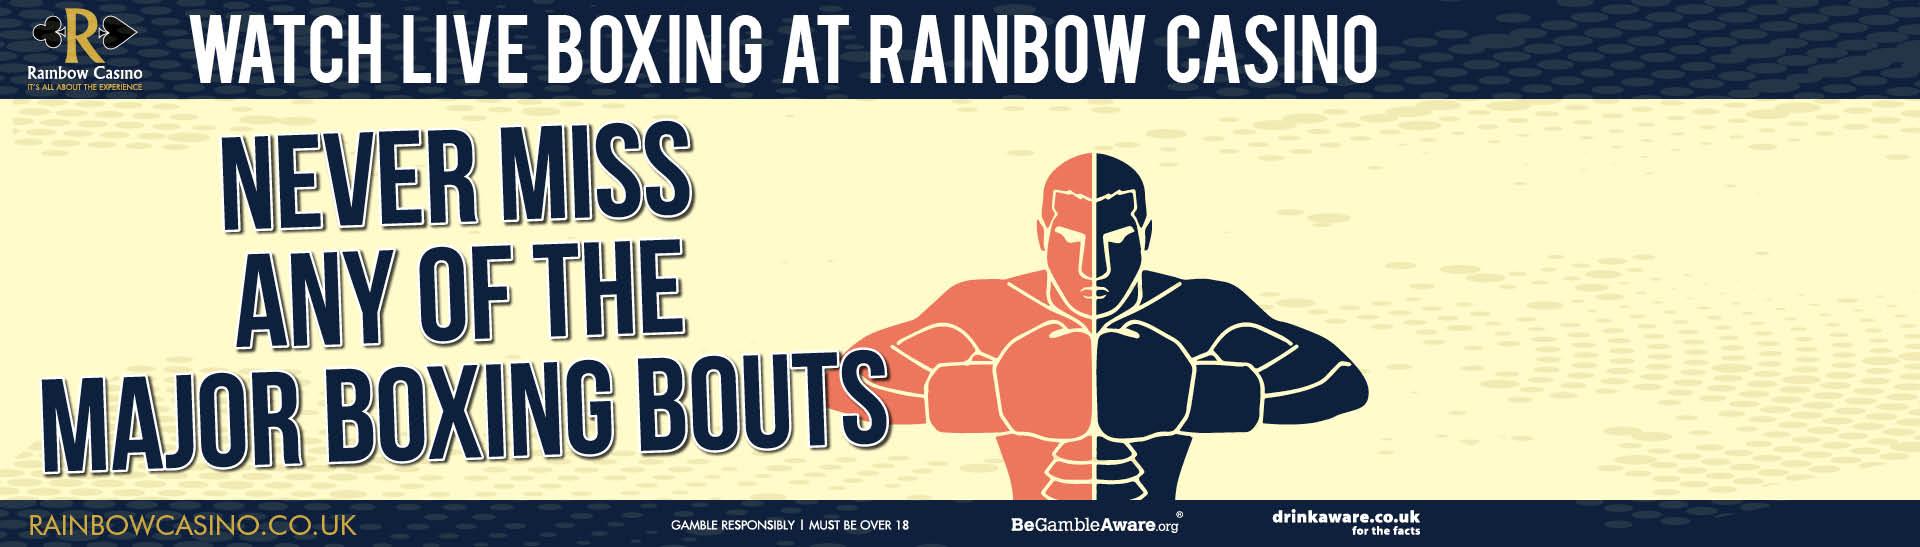 Rainbow Boxing Generic Web Graphic 1920X547.jpg